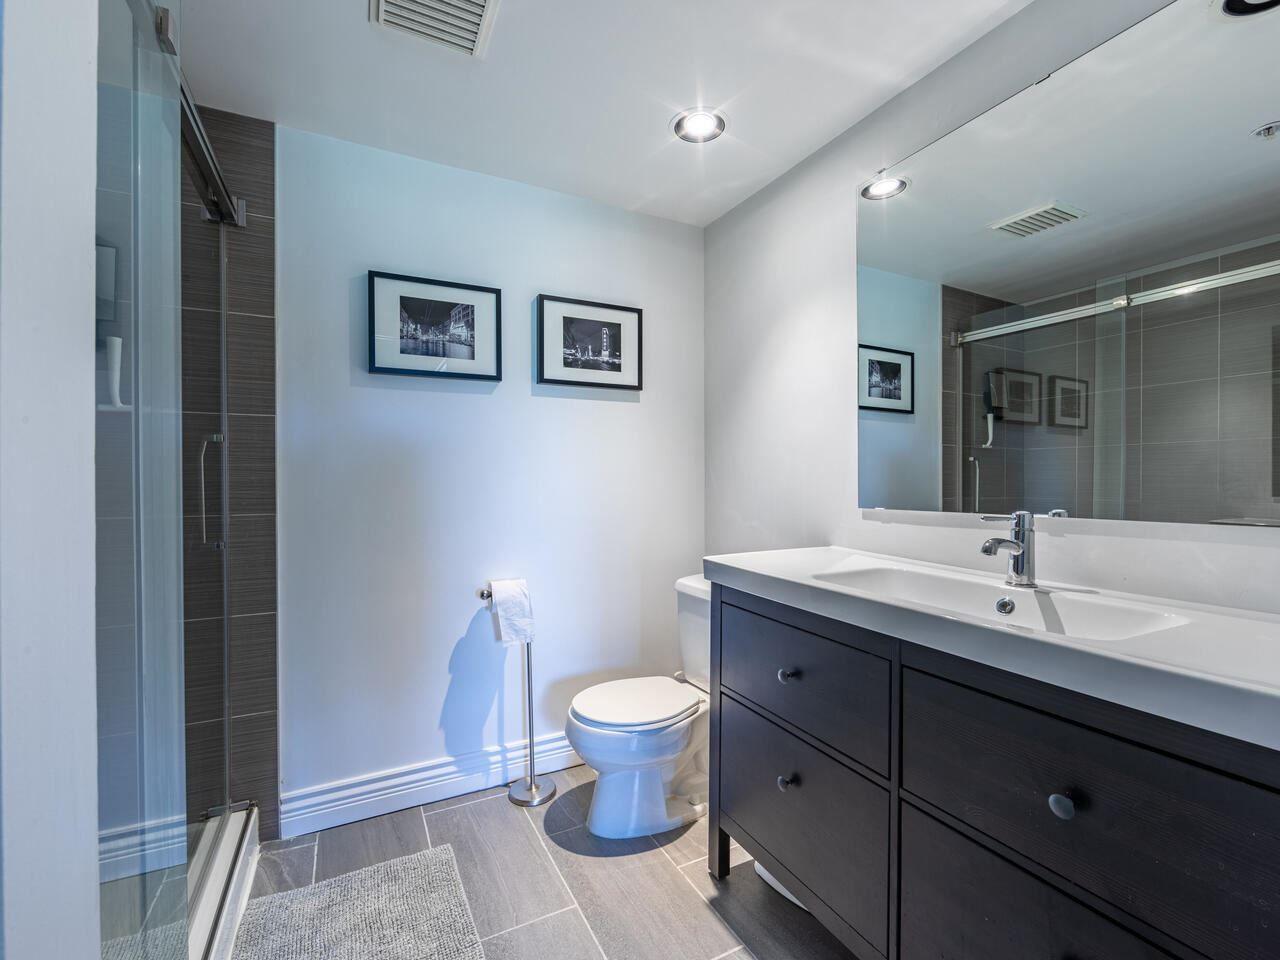 "Photo 15: Photos: 226 5800 ANDREWS Road in Richmond: Steveston South Condo for sale in ""THE VILLAS"" : MLS®# R2569641"